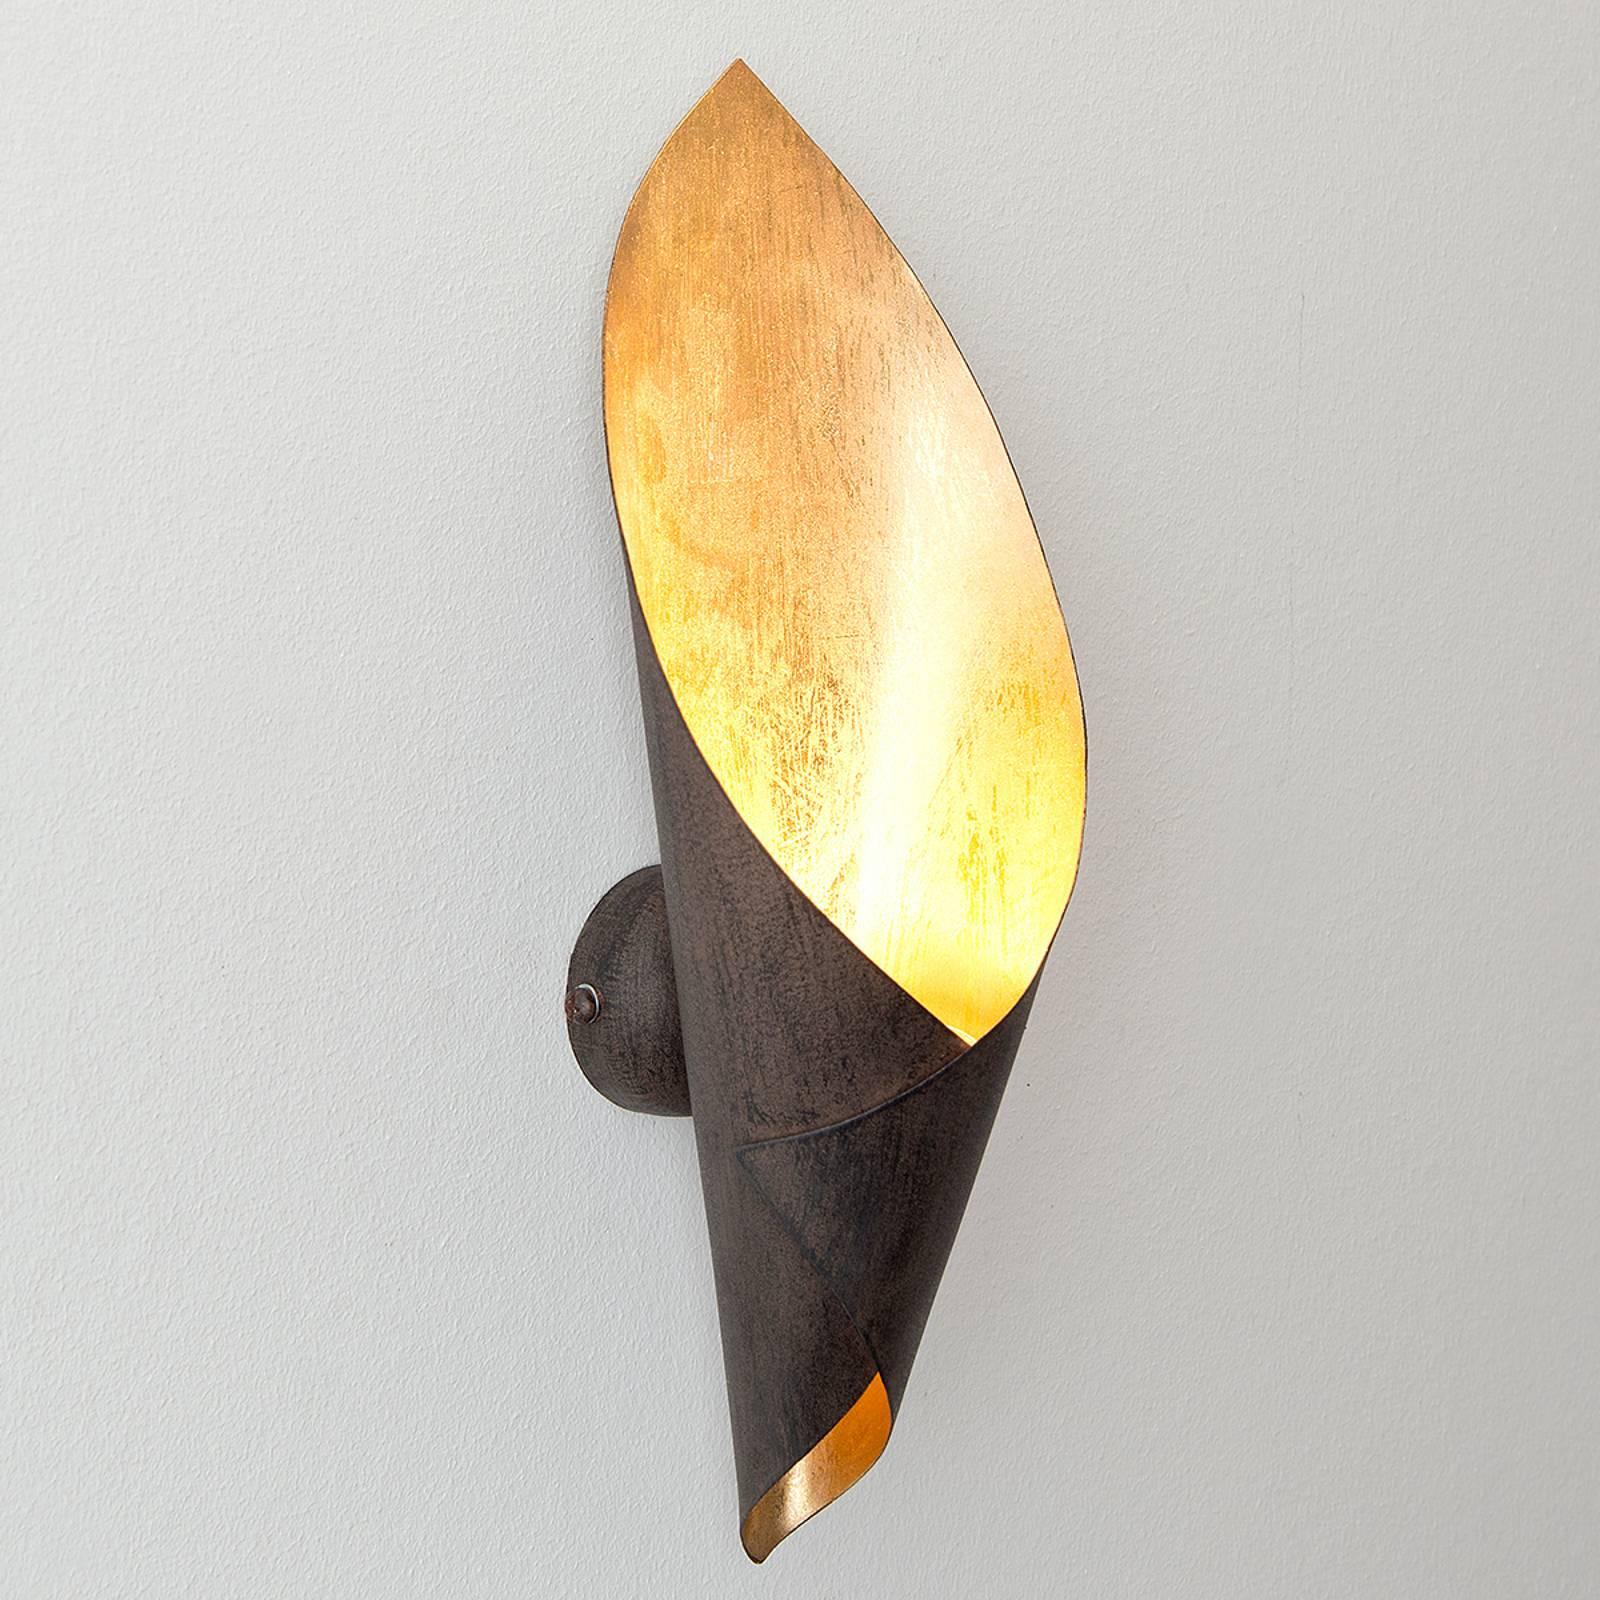 Fiaccola Piccolo - musta-ruskea seinävalaisin